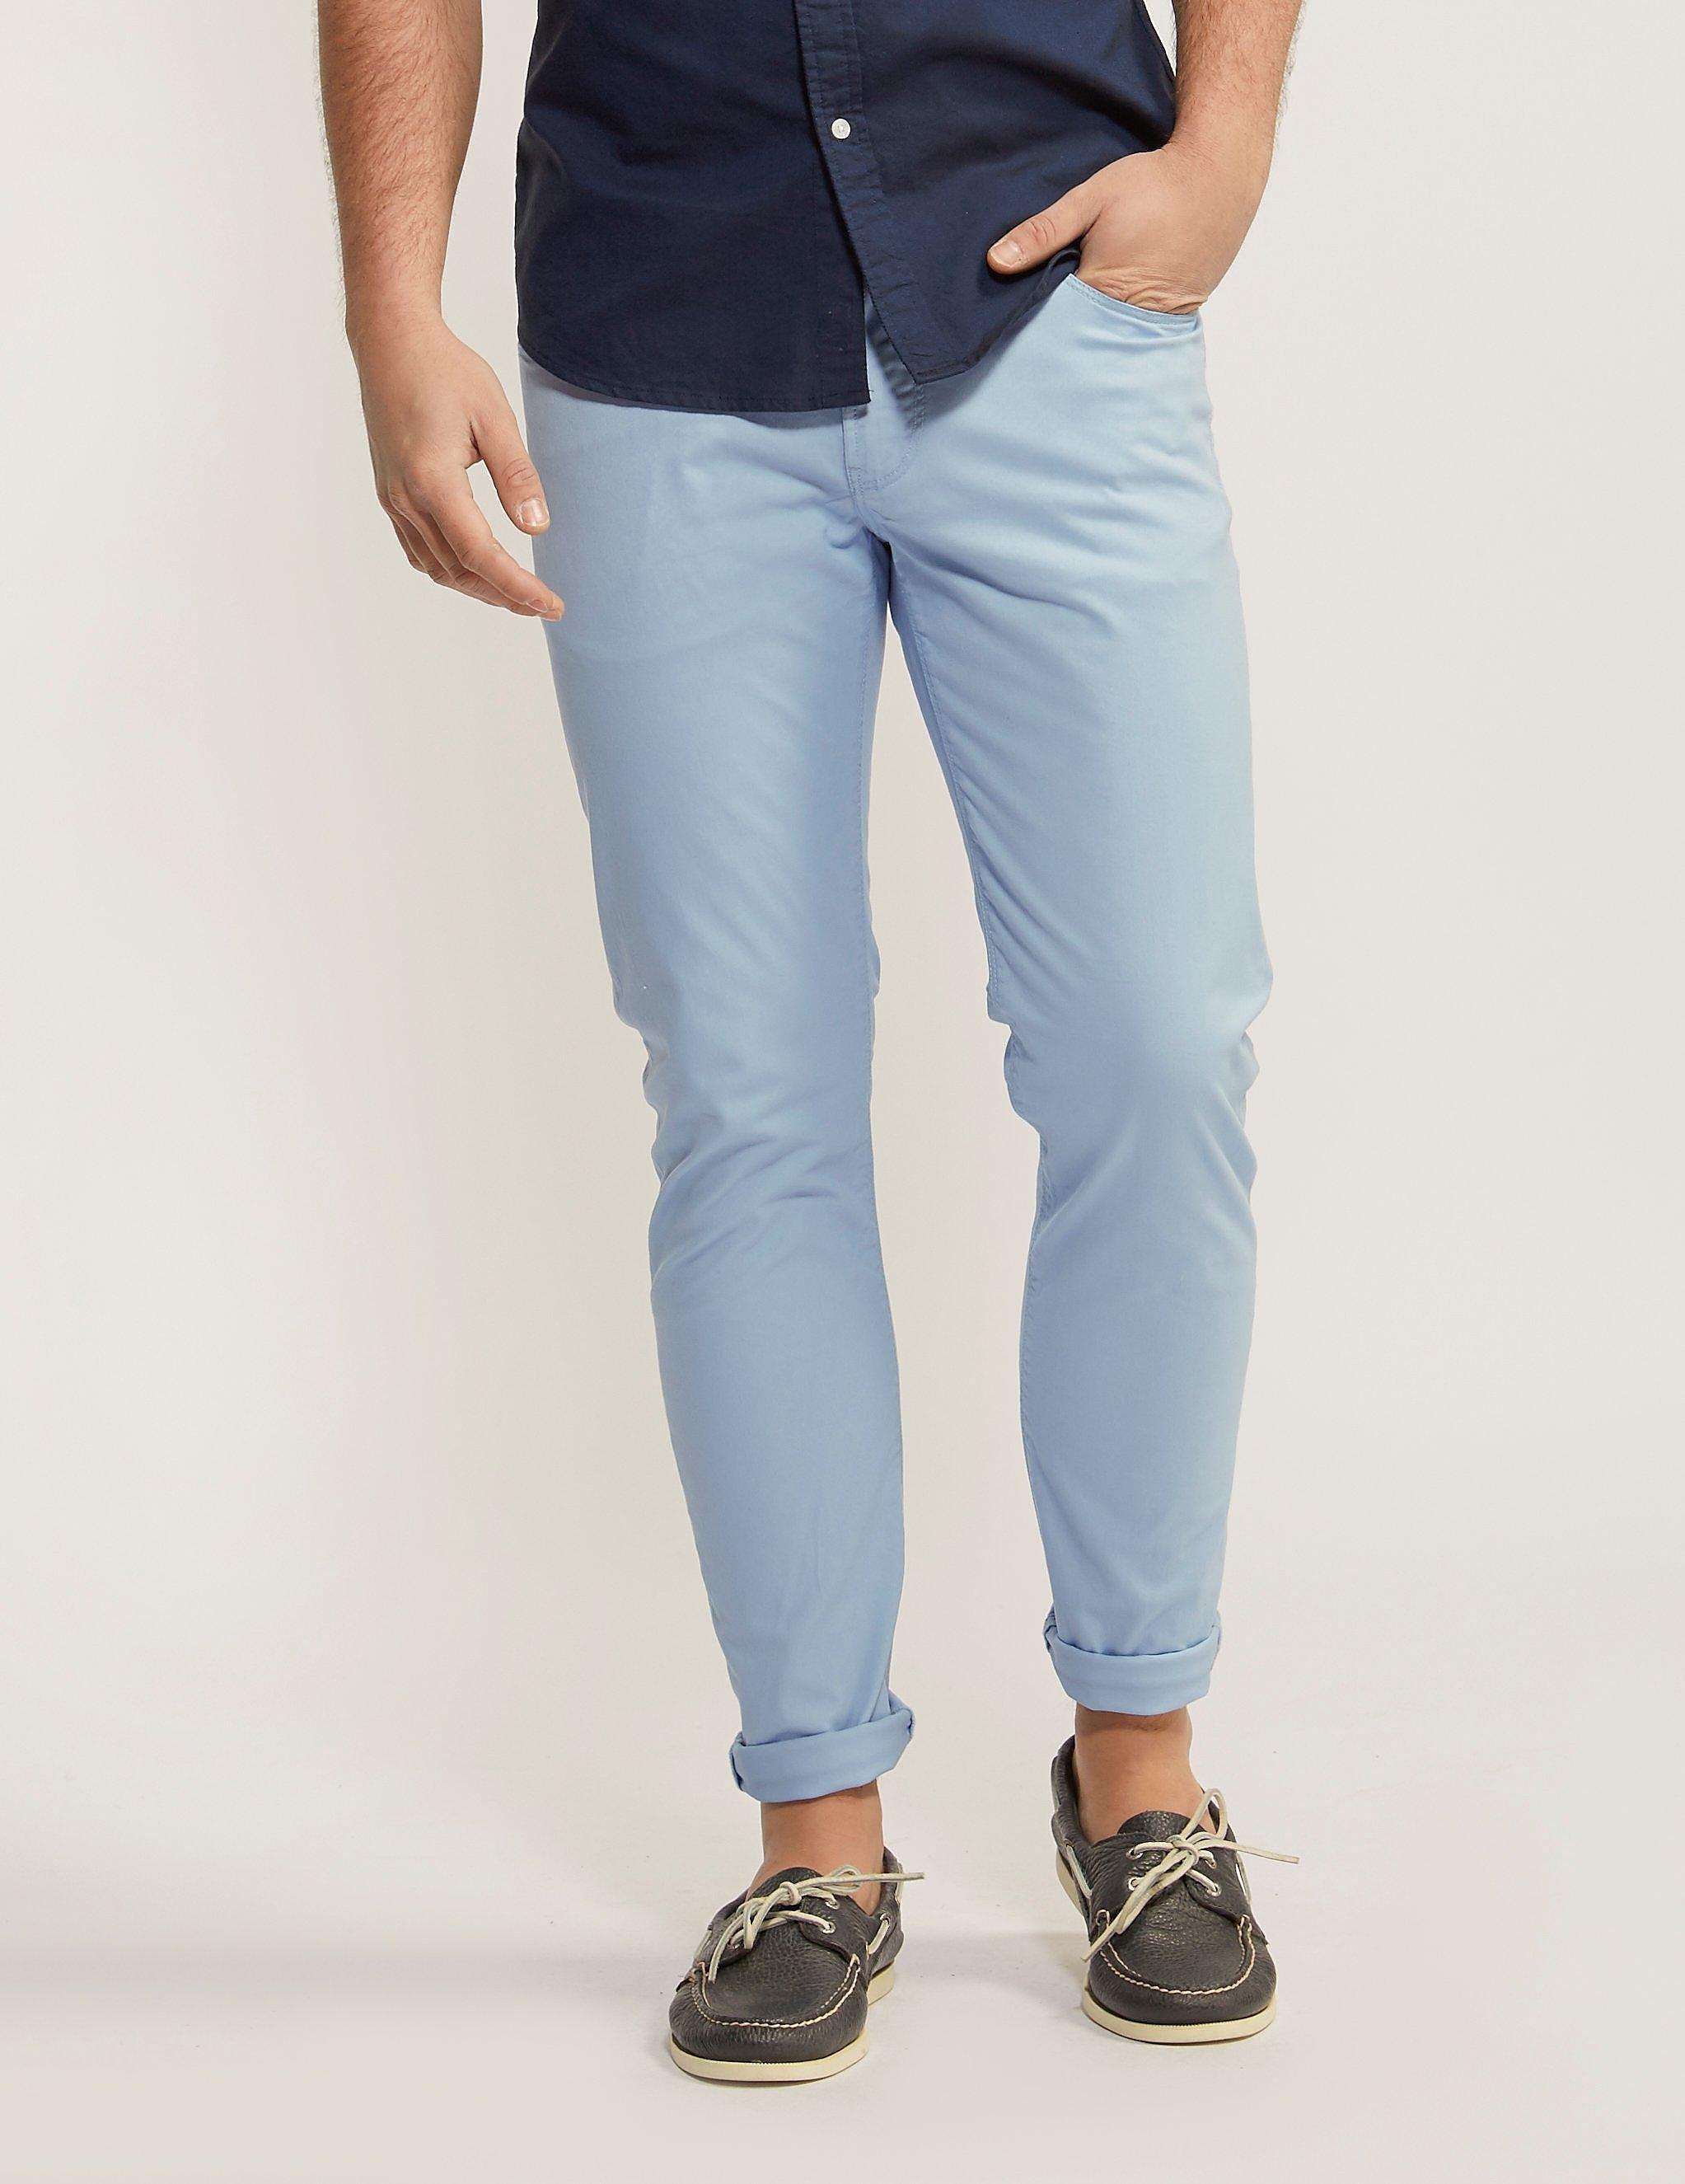 Armani Jeans J06 Cotton Chino - Regular Leg